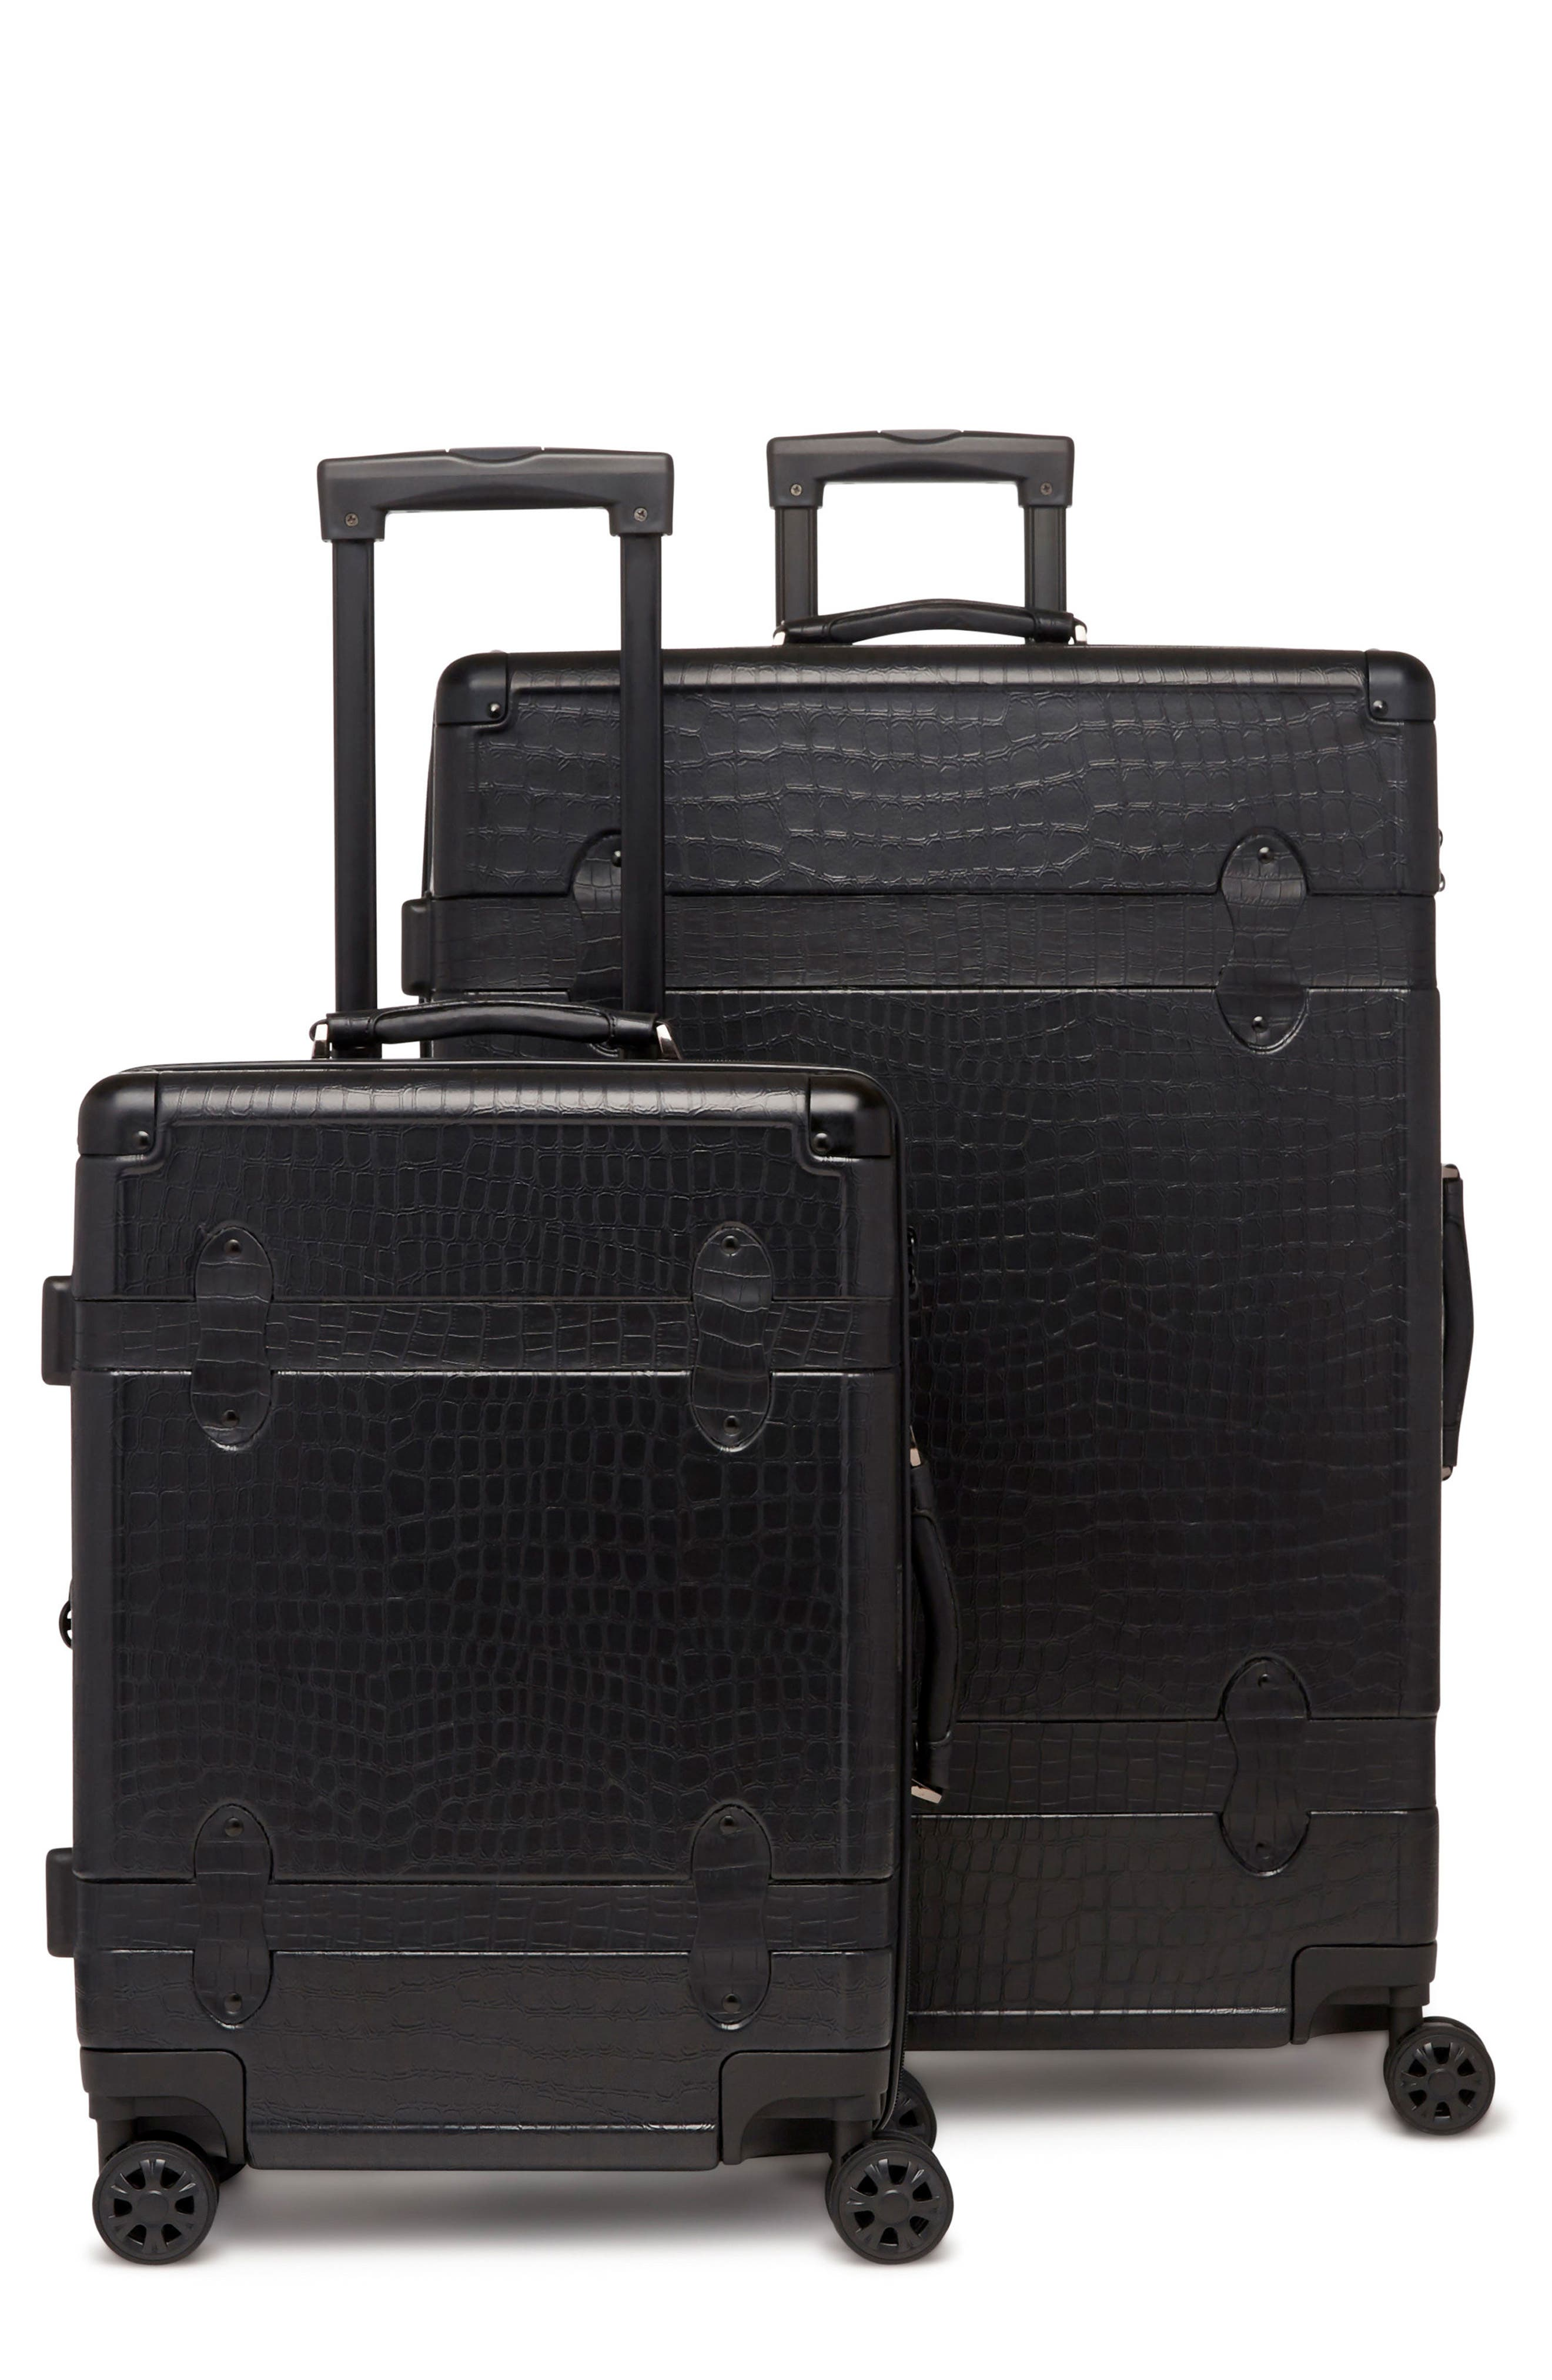 CALPAK 2-Piece 30-Inch Trunk & 22-Inch Trunk Rolling Luggage Set